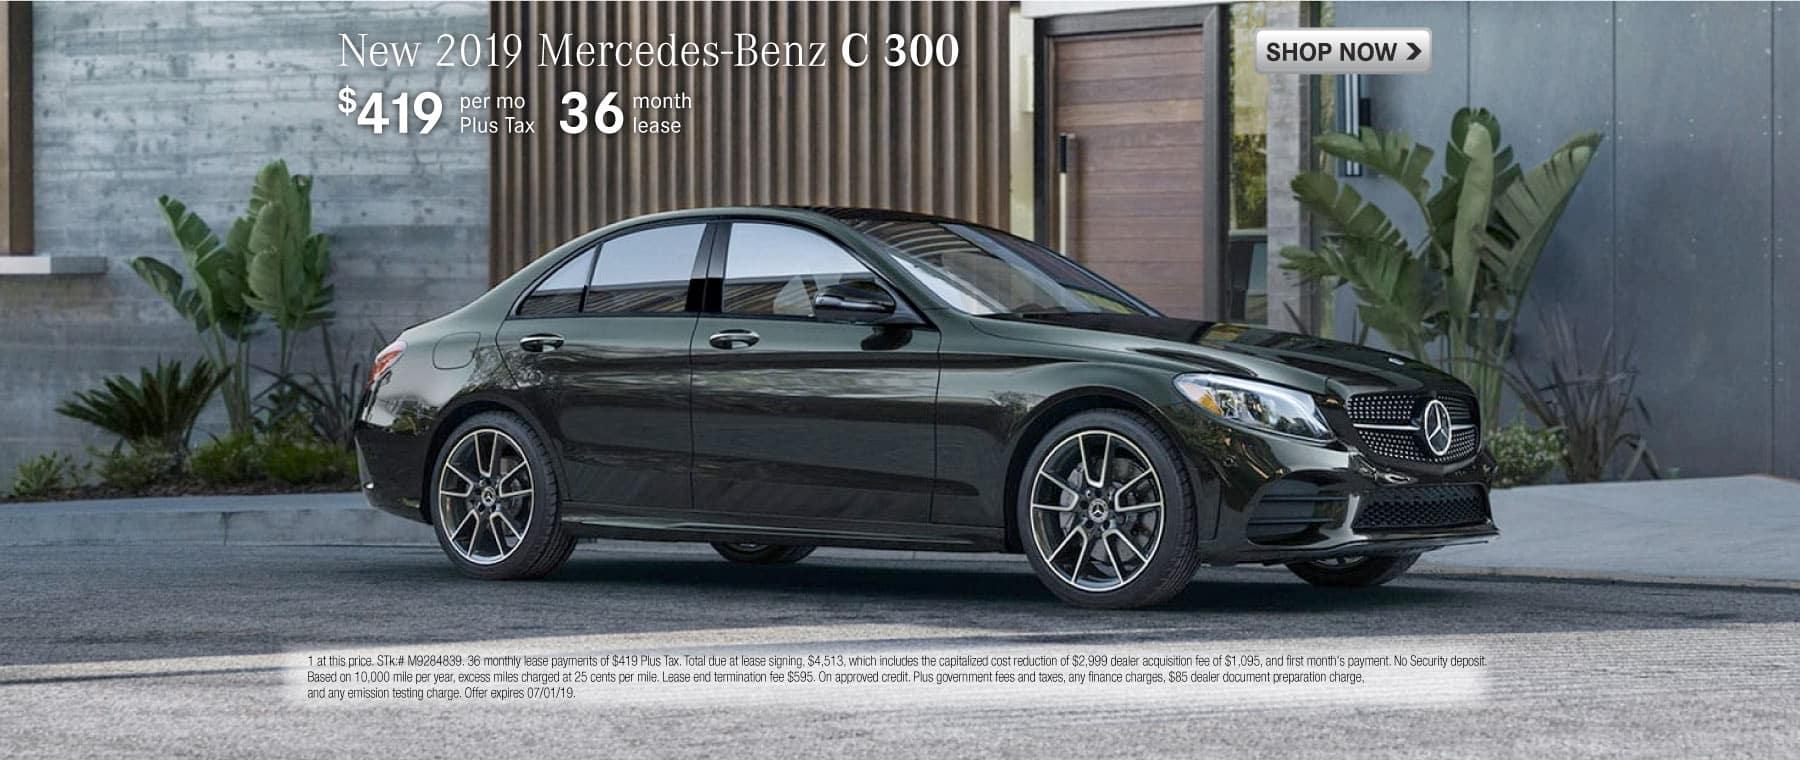 new 2019 mercedes-benz c 300